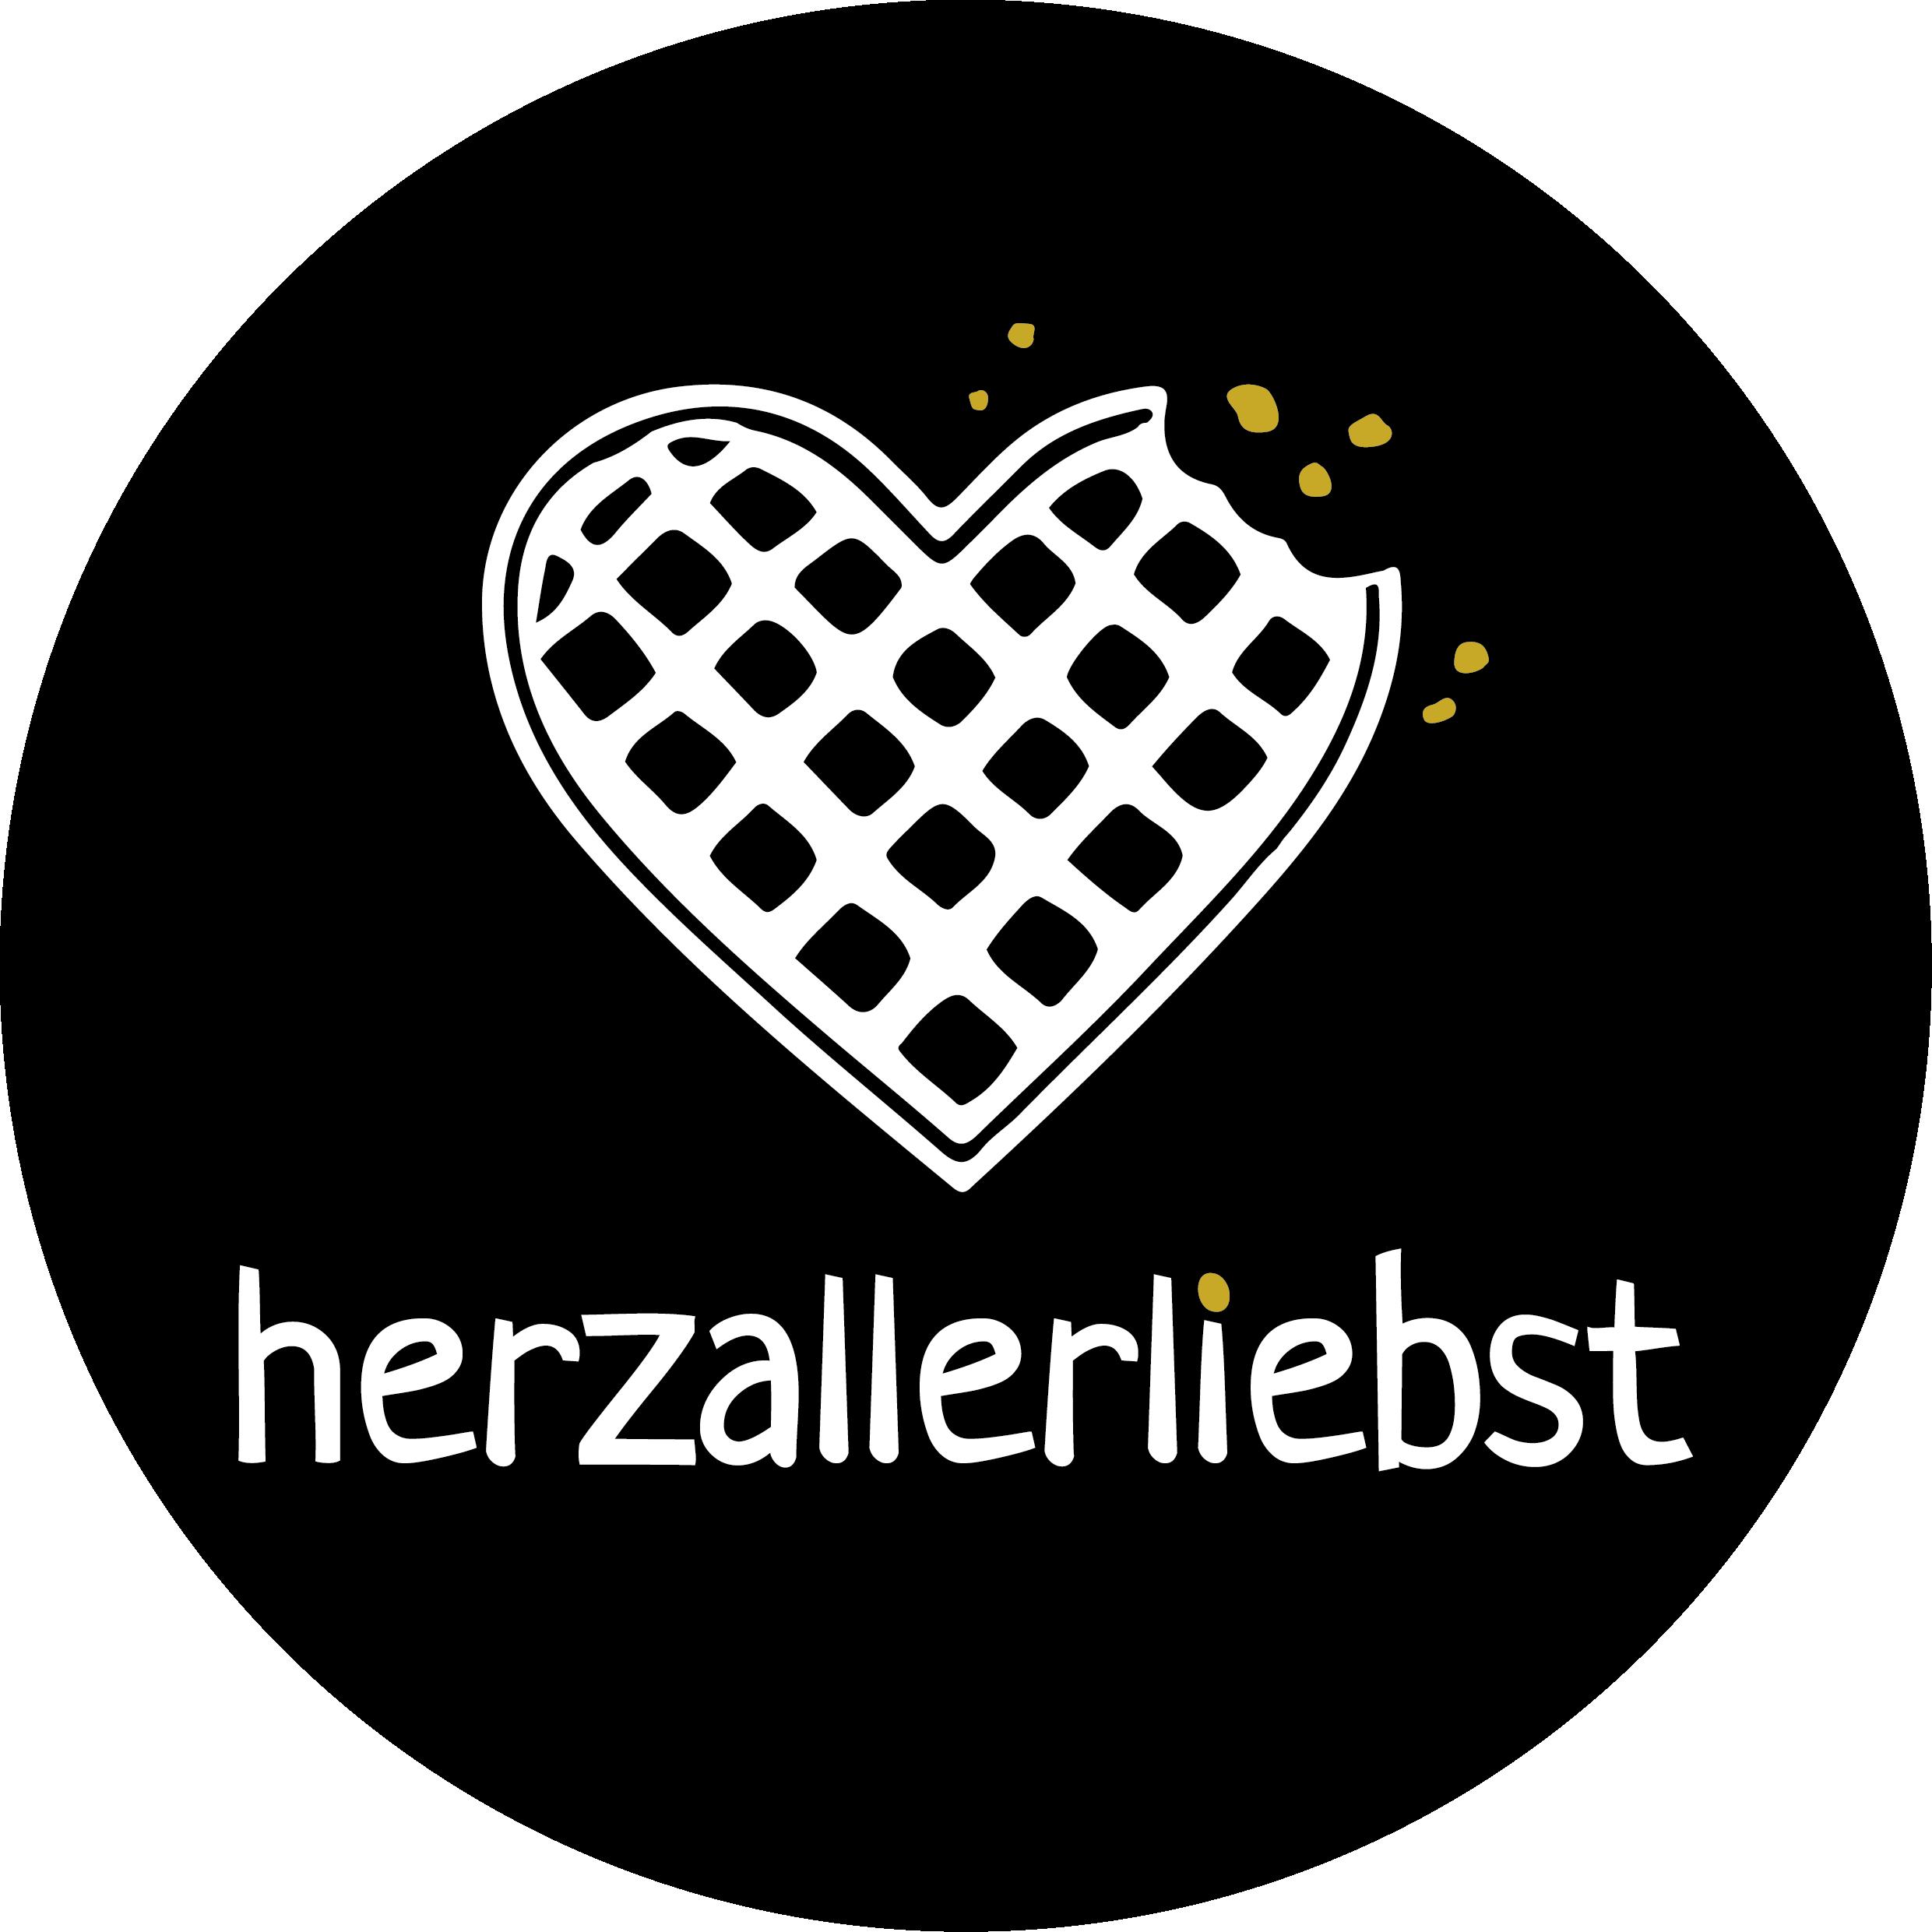 herzallerliebst Logo